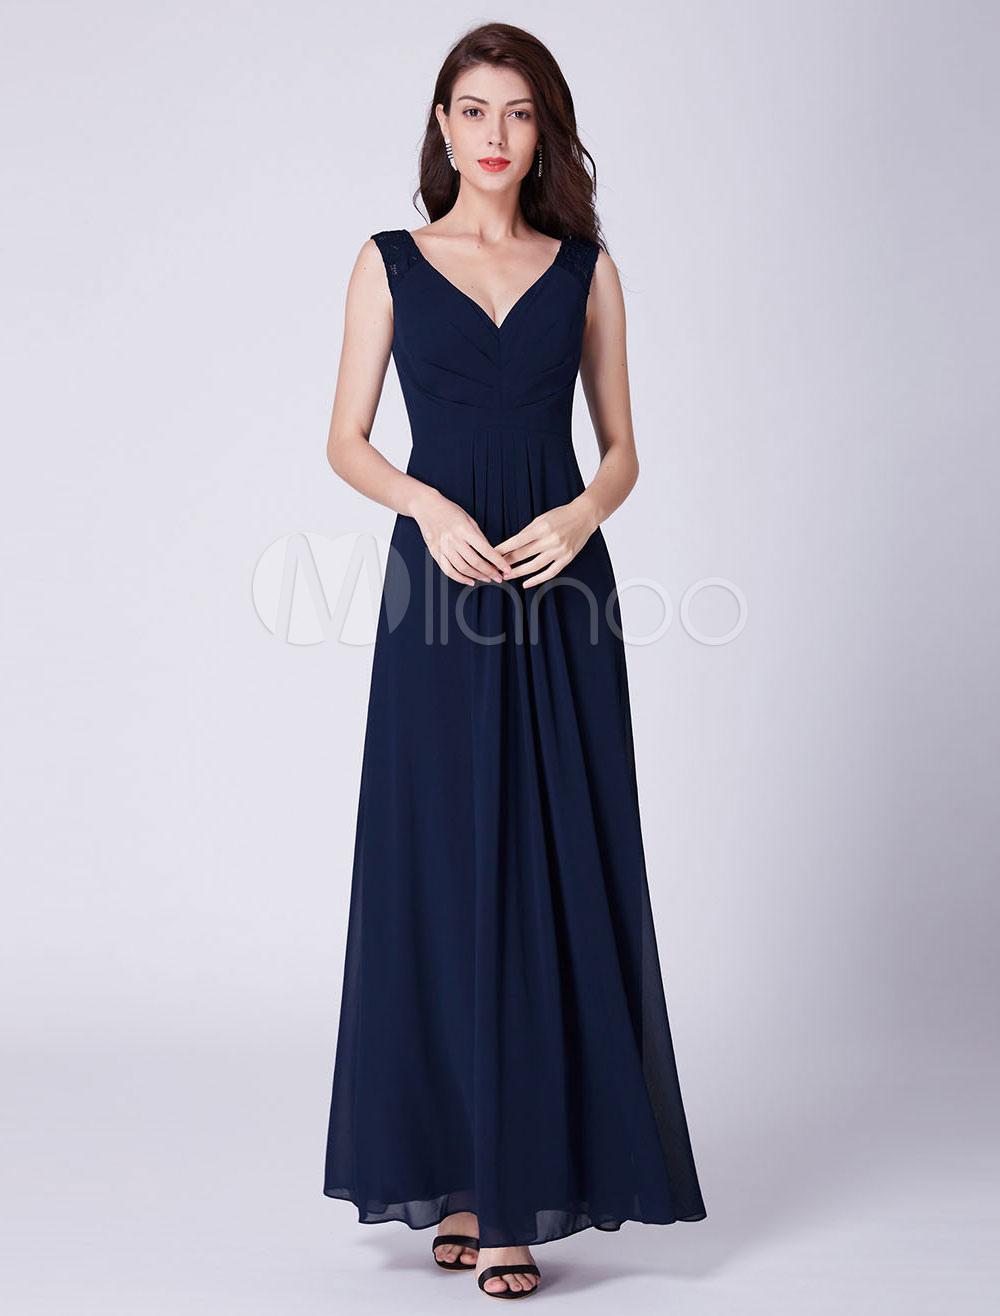 Ballkleider Lang V-Ausschnitt Brautjungfernkleid Dunkel Navy Chiffon  bodenlangen Abendkleid